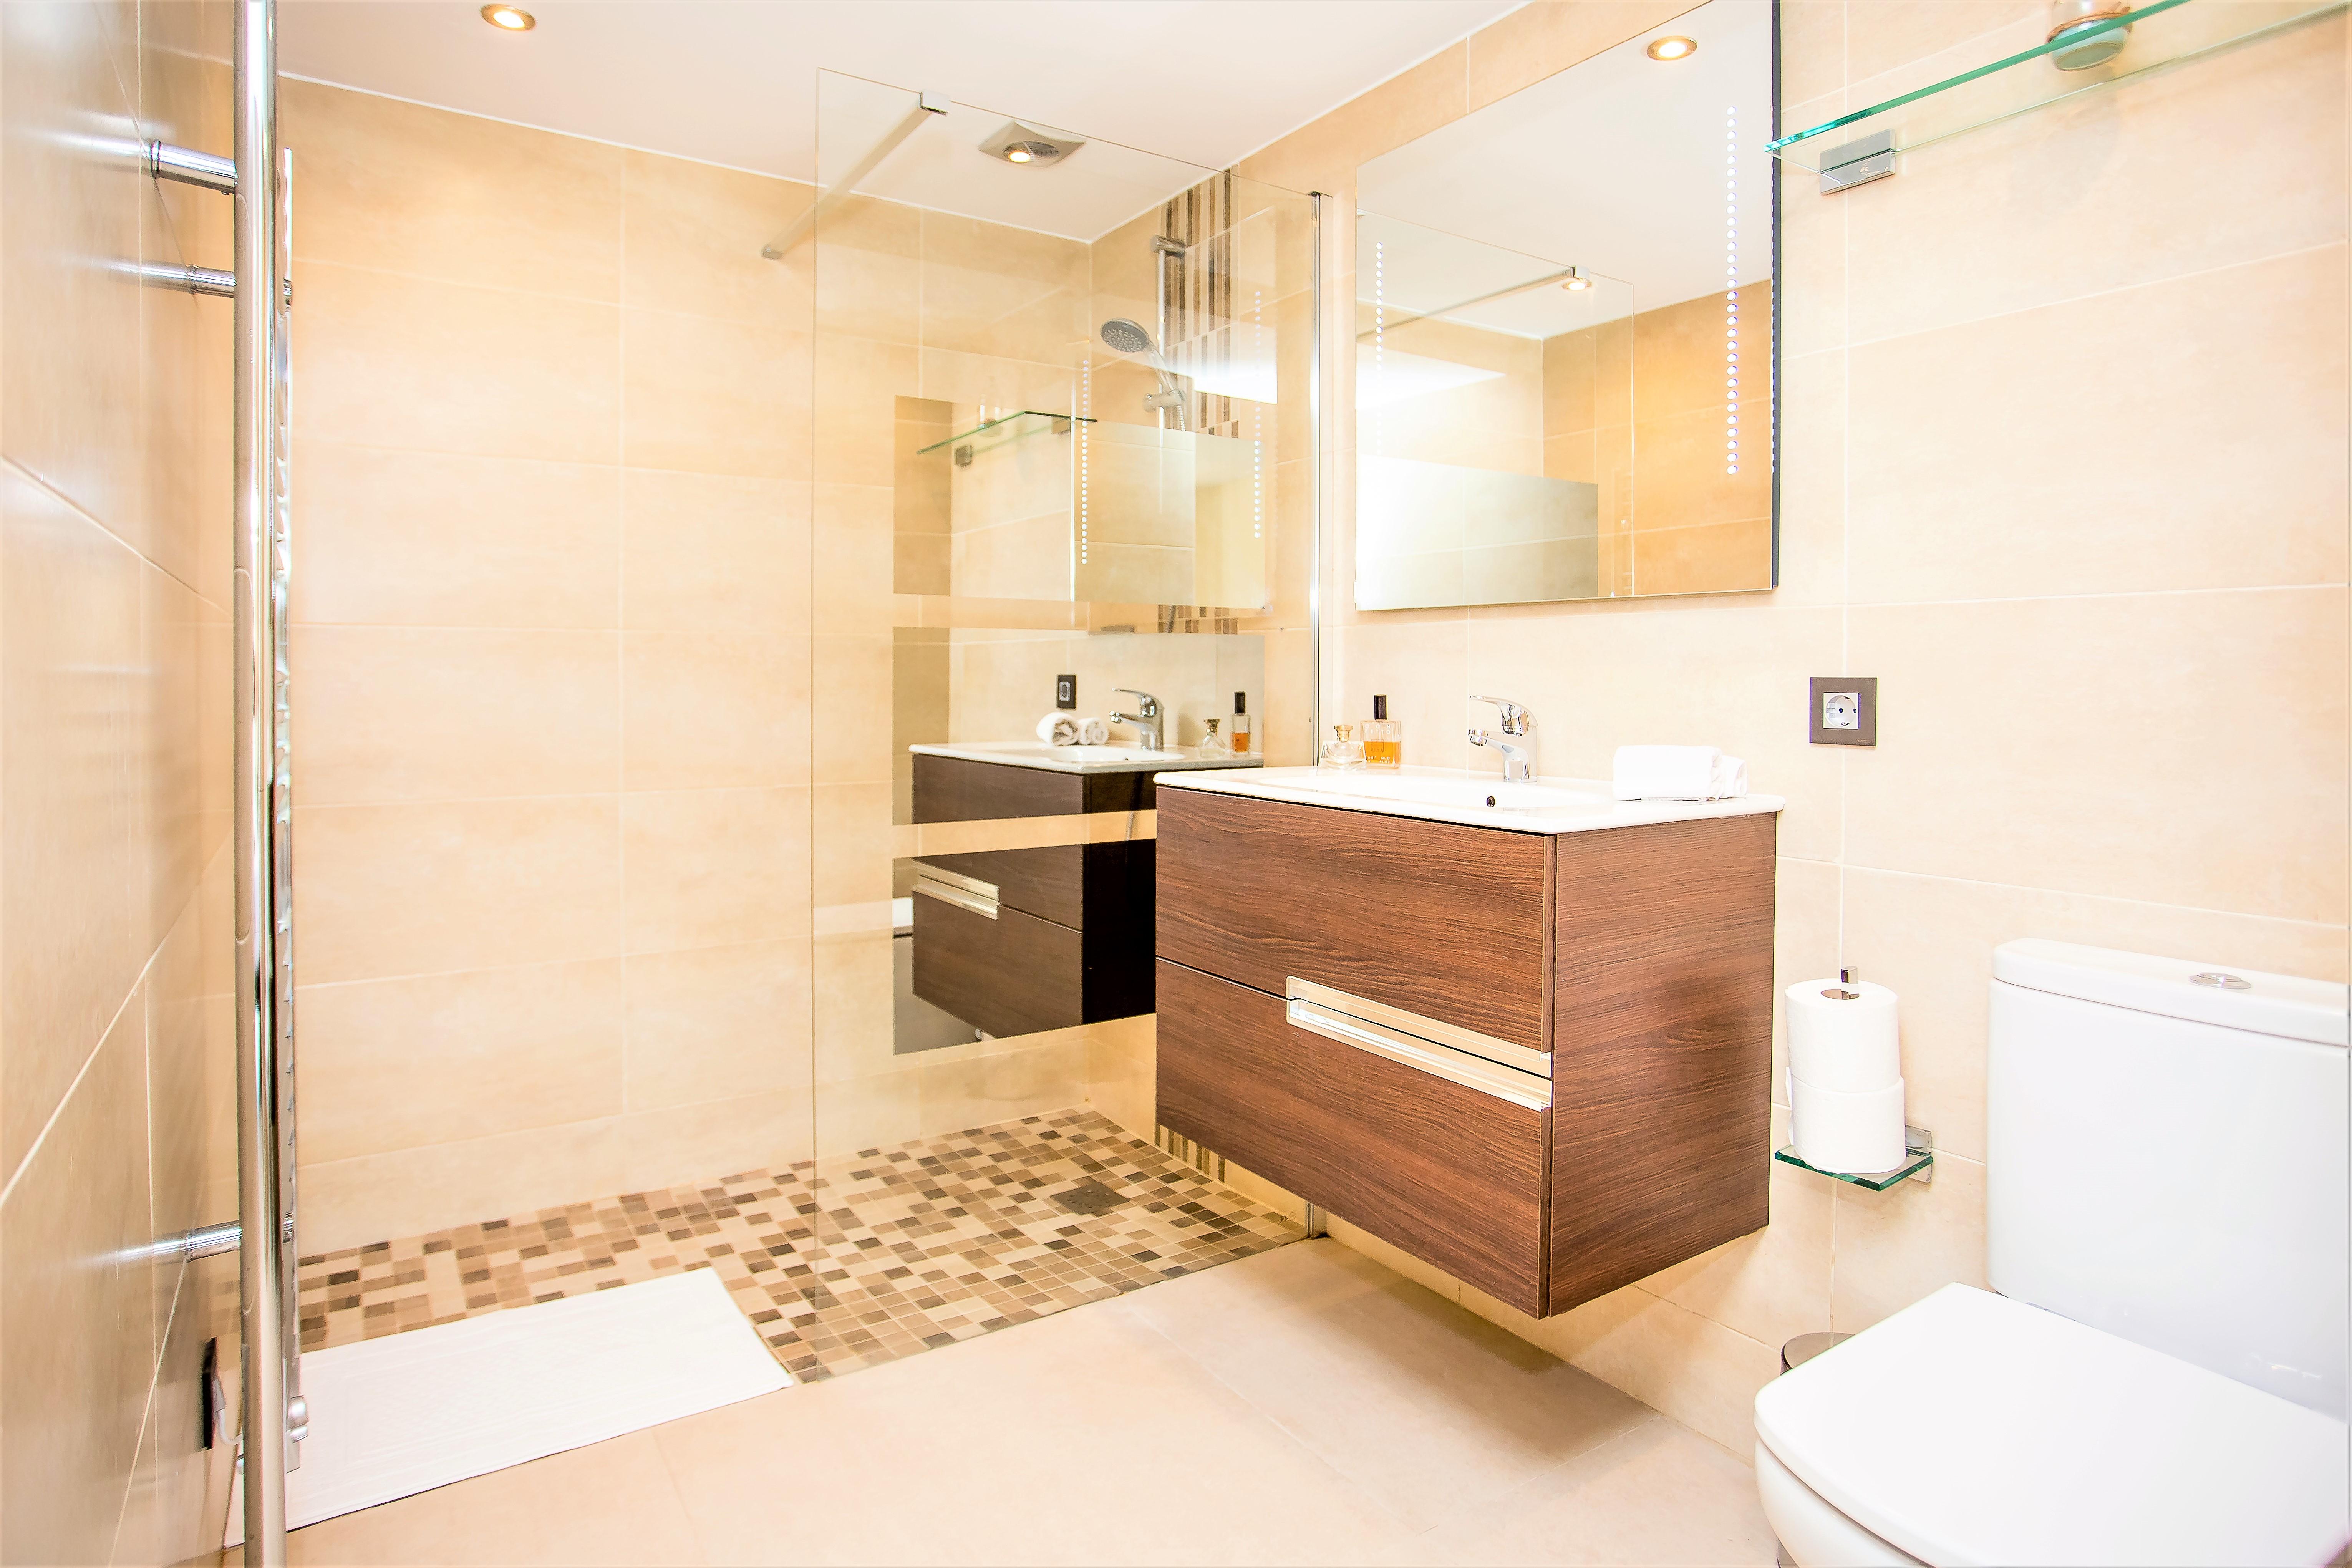 Apartment 8 Bedroom VILLA BY PUERTO BANUS   SEA 5 min                                photo 20250688